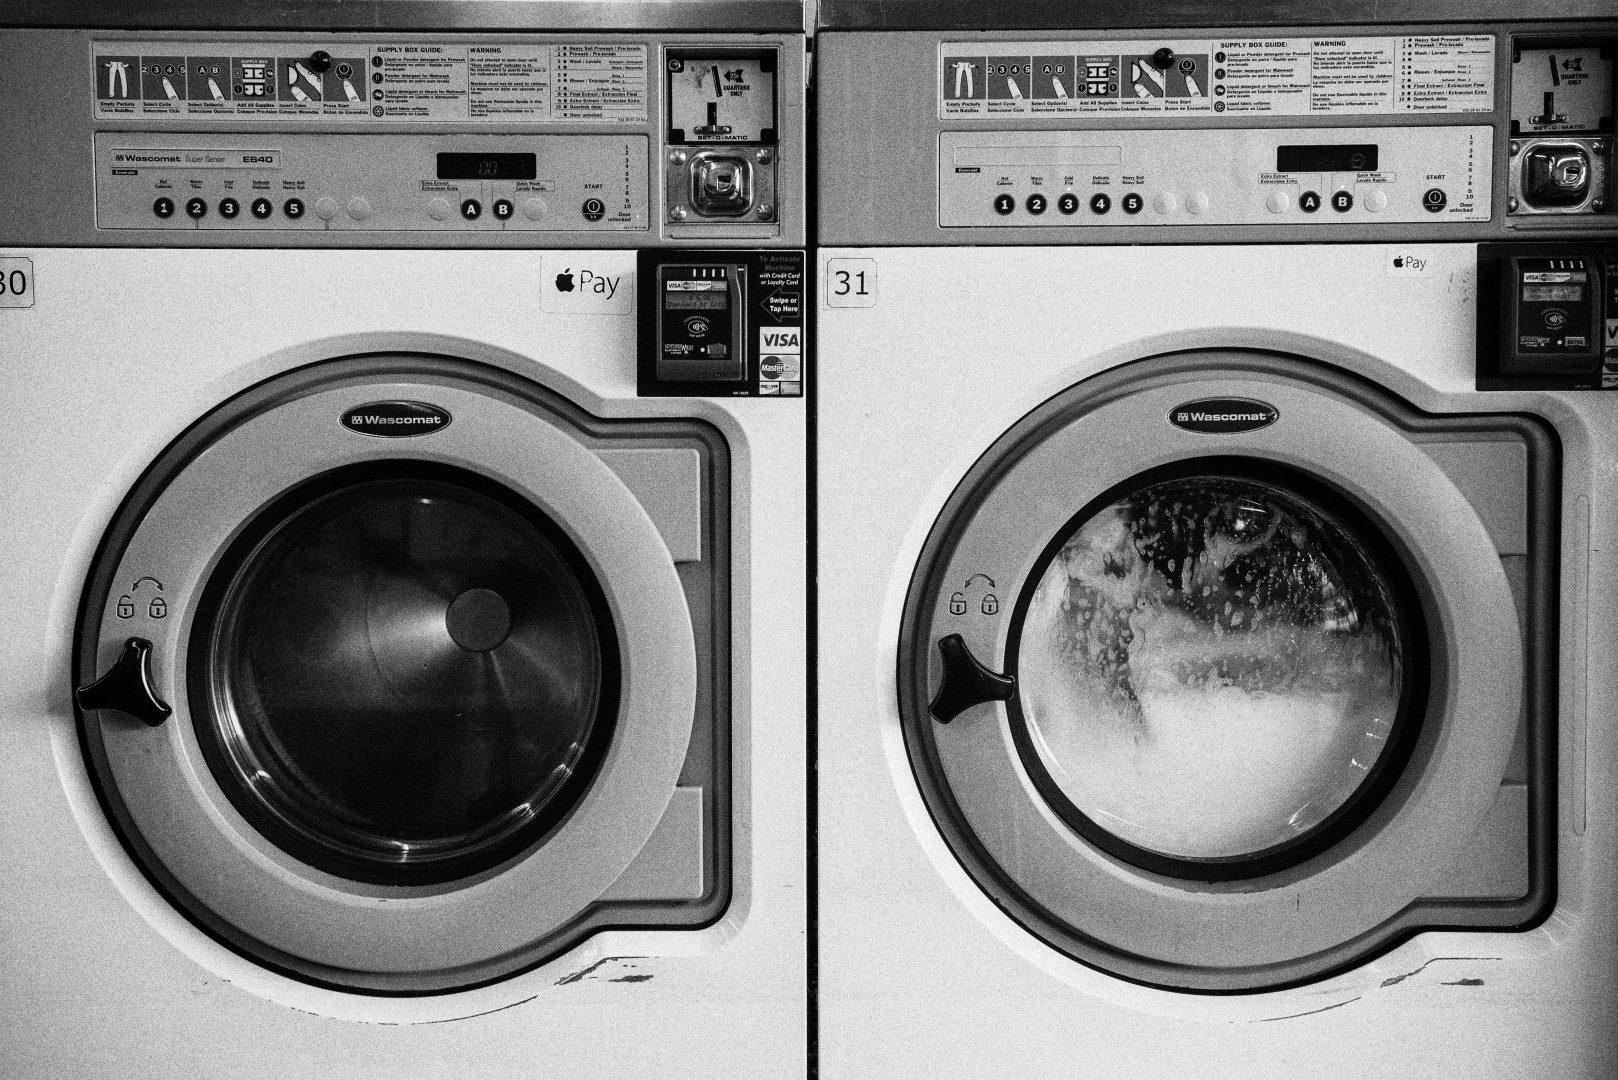 Dekbed wassen